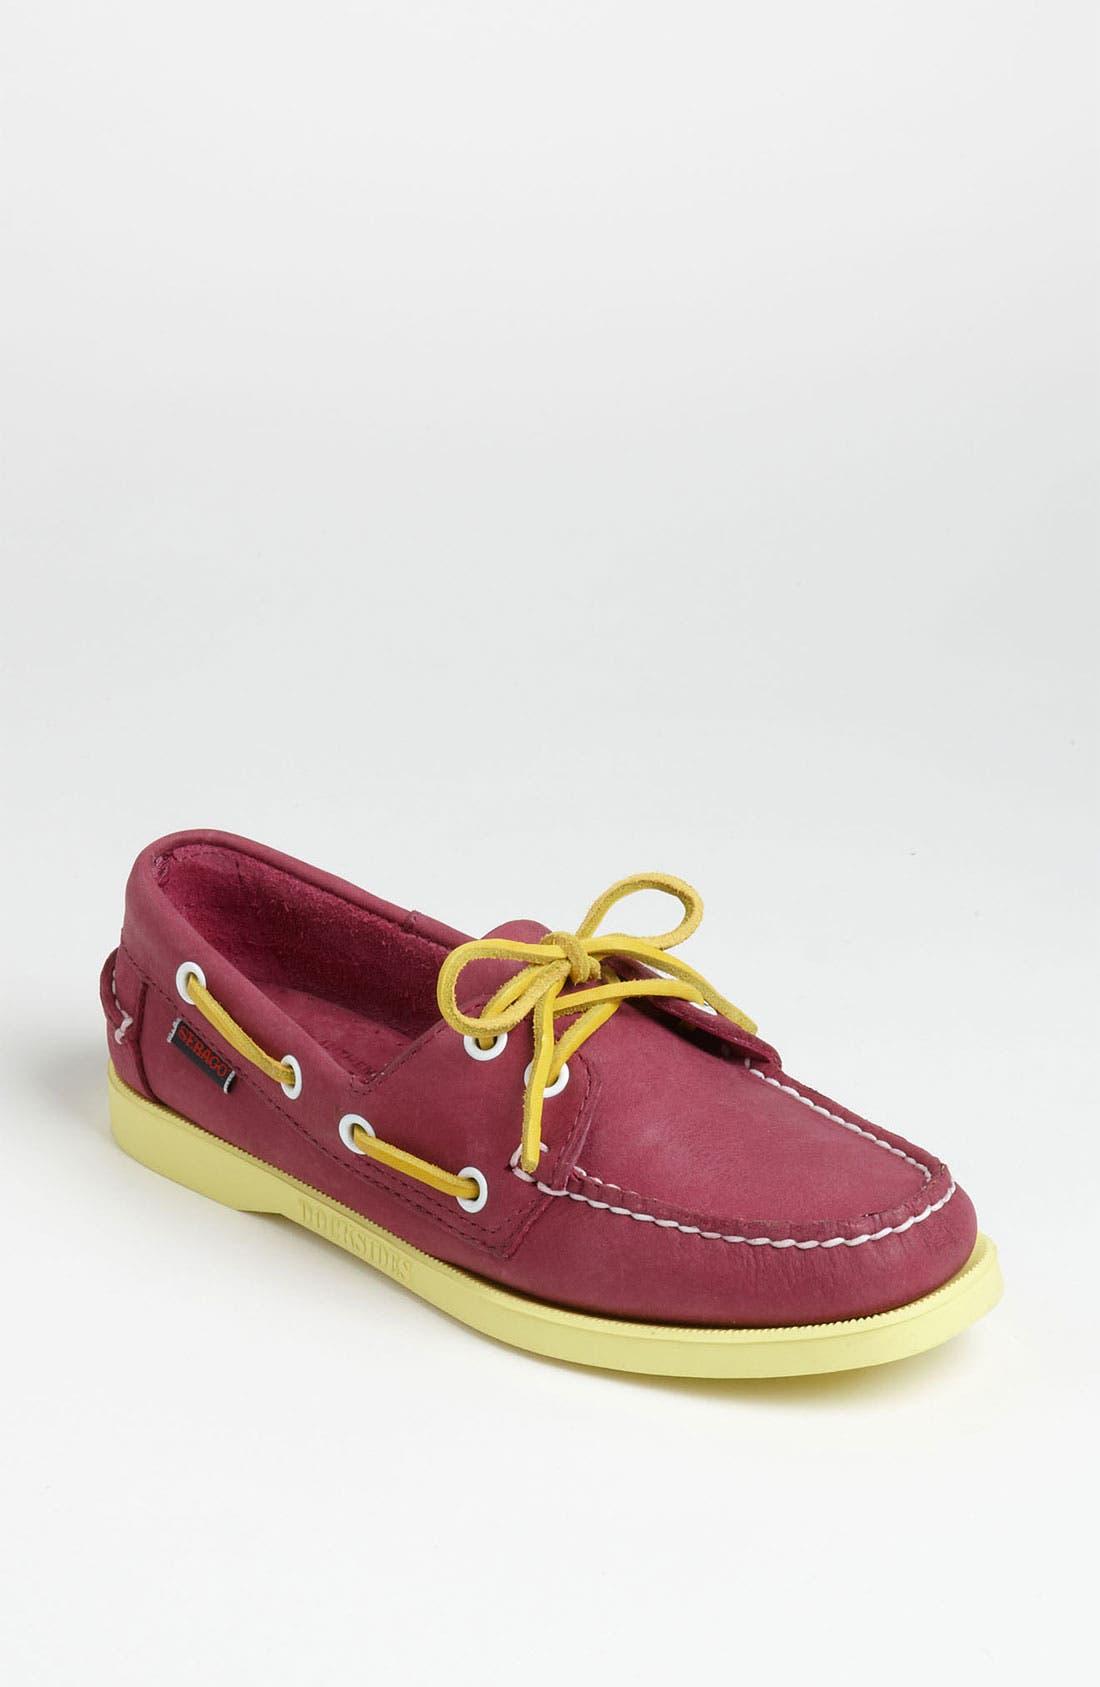 Main Image - Sebago 'Docksides' Boat Shoe